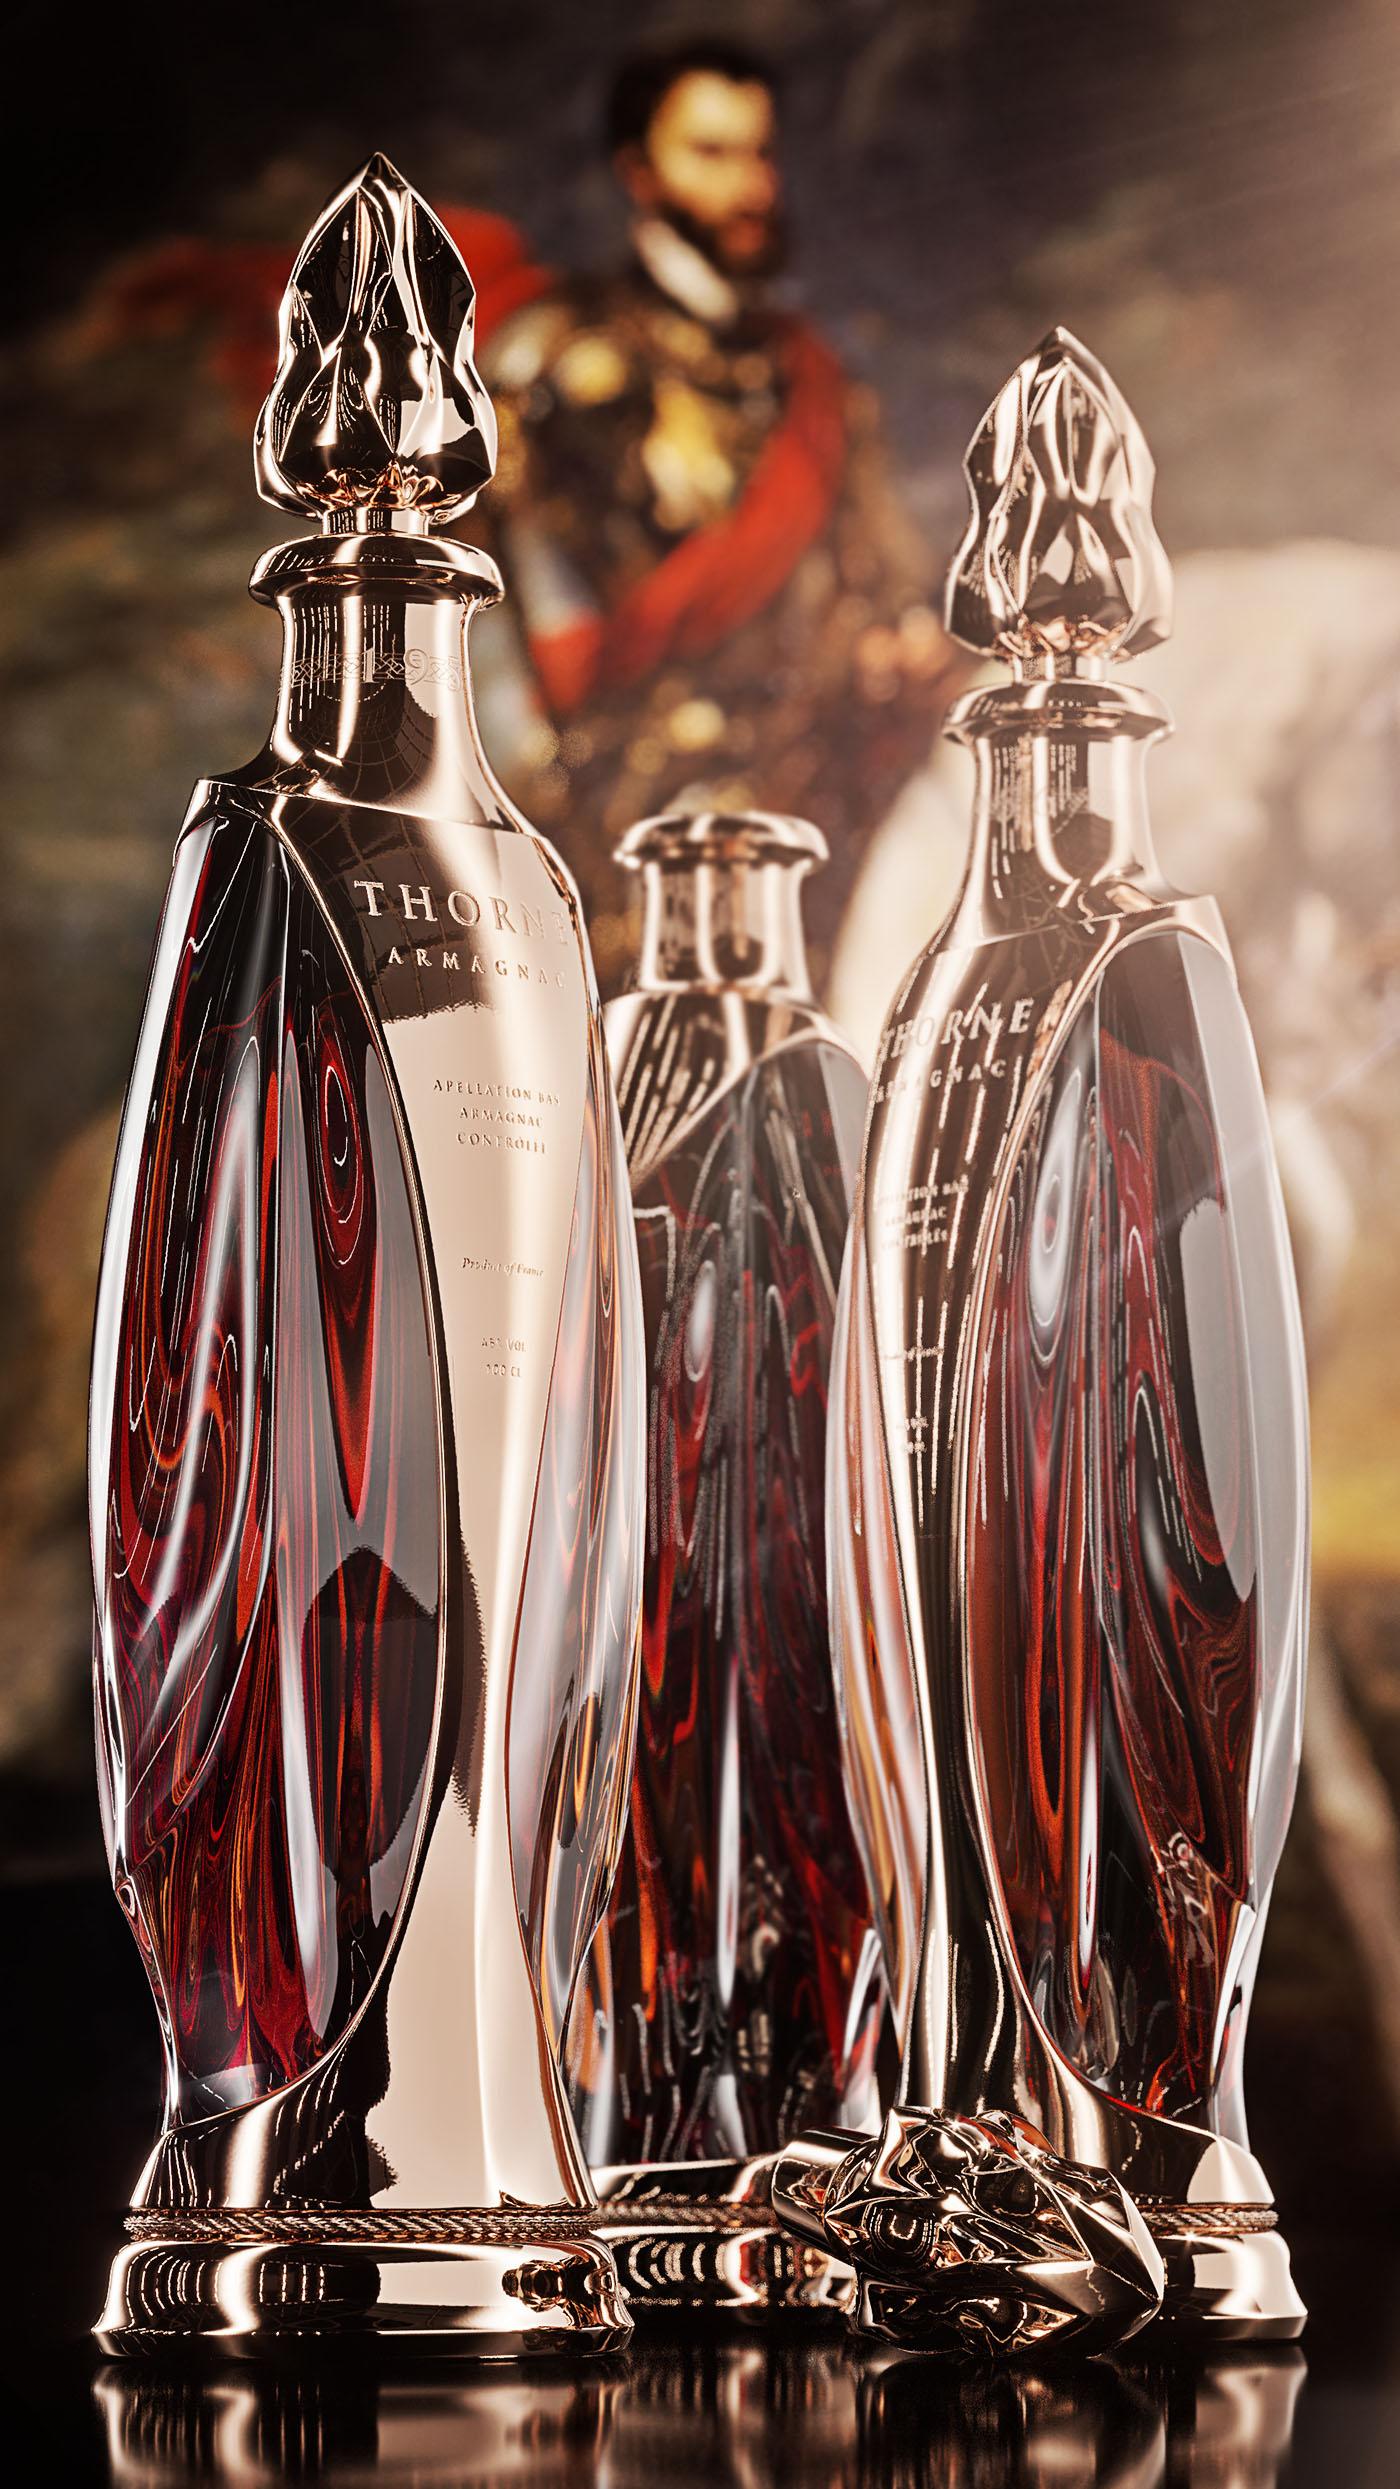 Thorne luxury armagnac bottle 8.jpg